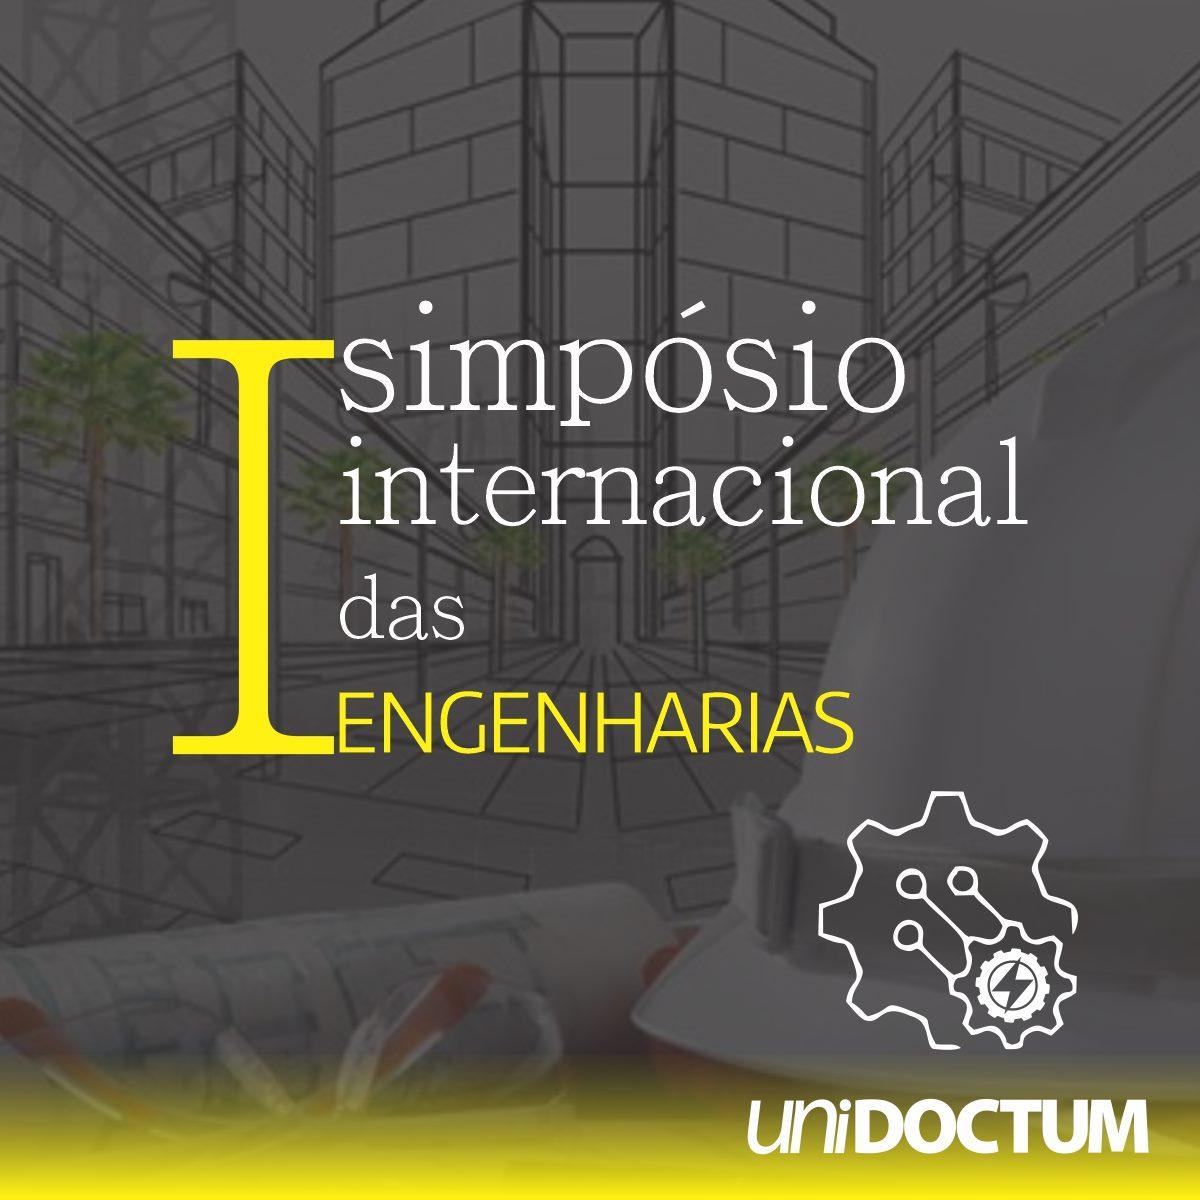 UniDoctum promove I Simpósio Internacional das Engenharias